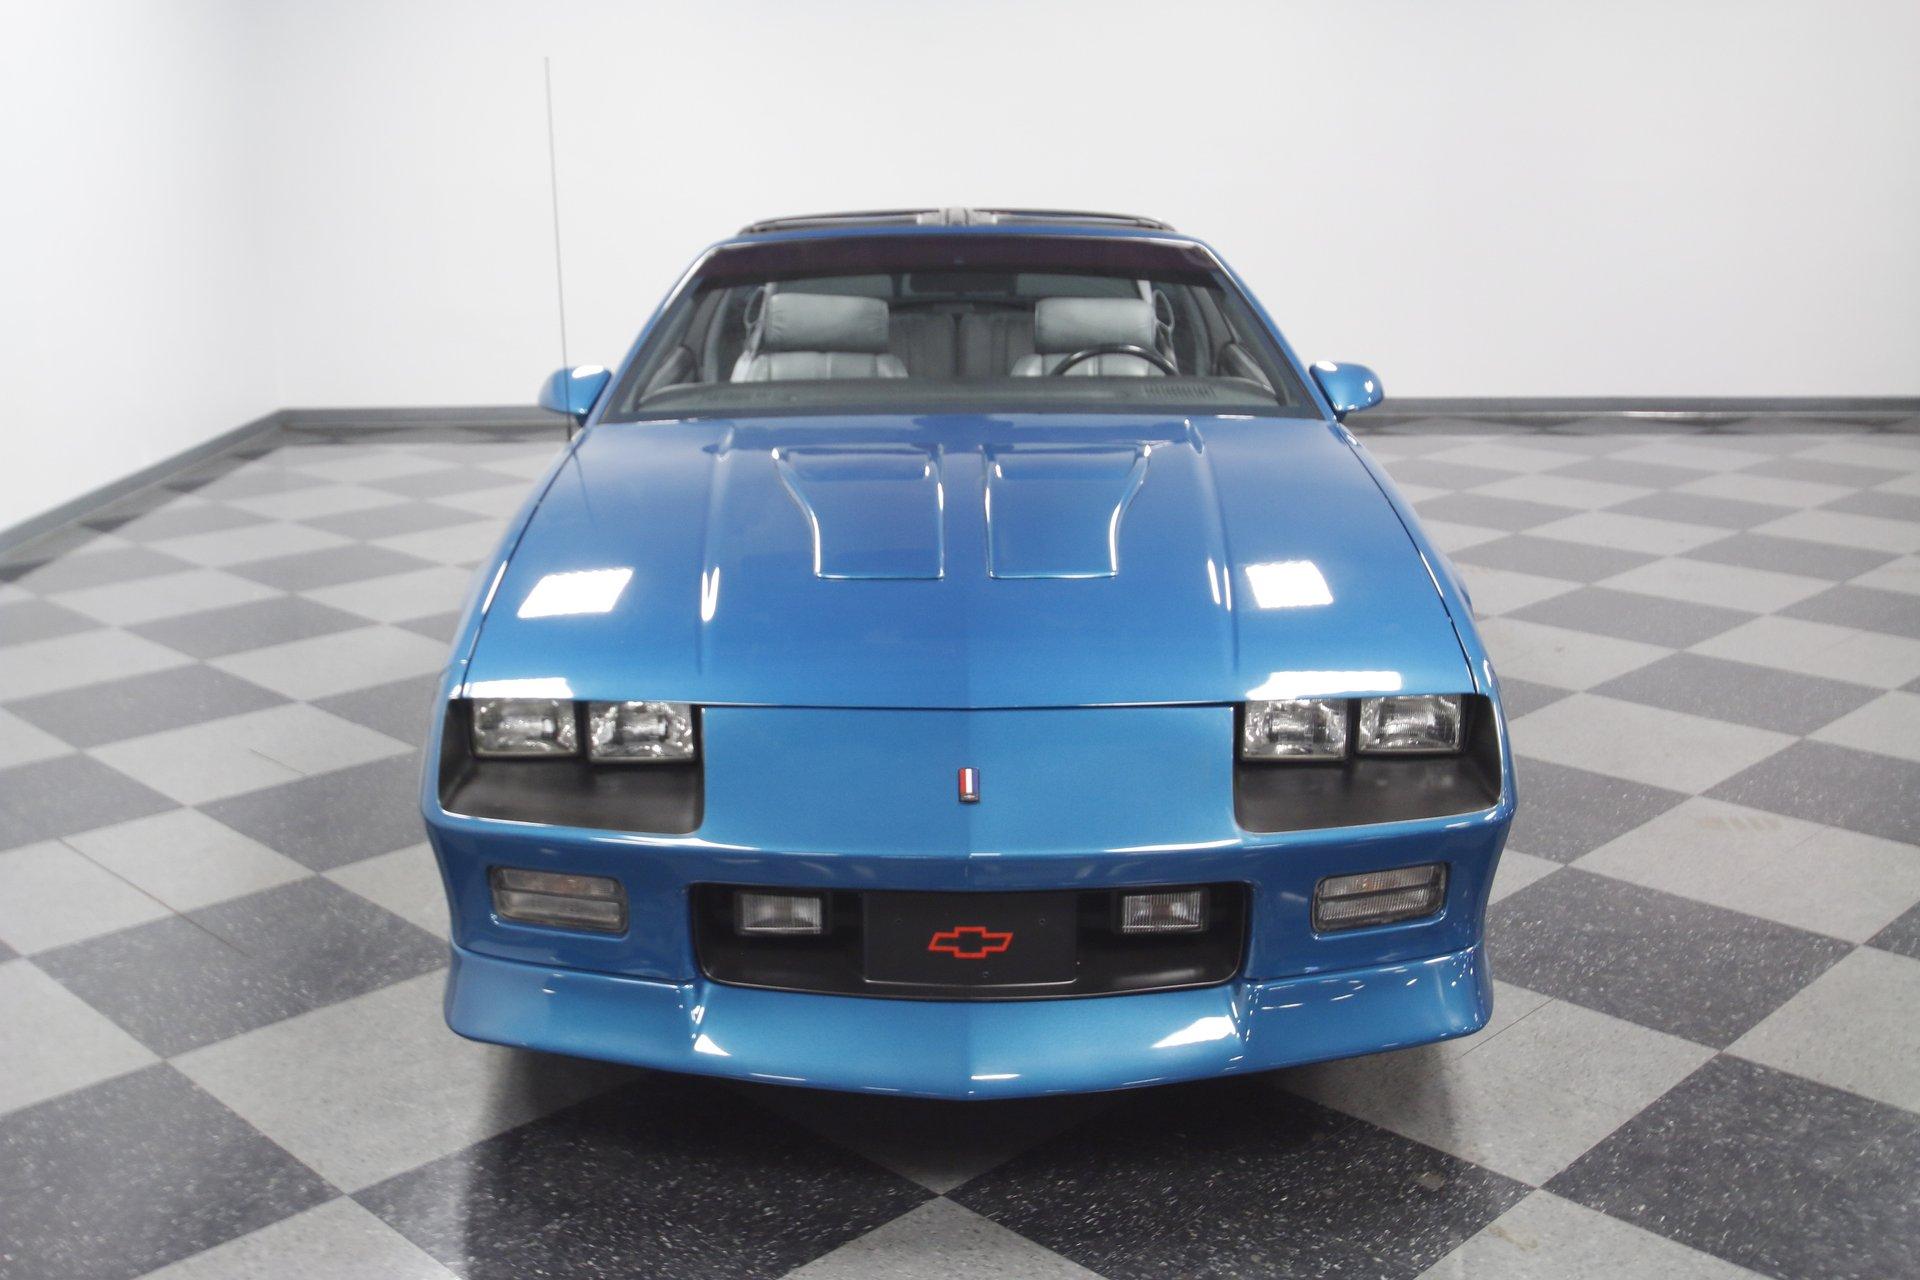 1992 Chevrolet Camaro | Streetside Classics - The Nation's